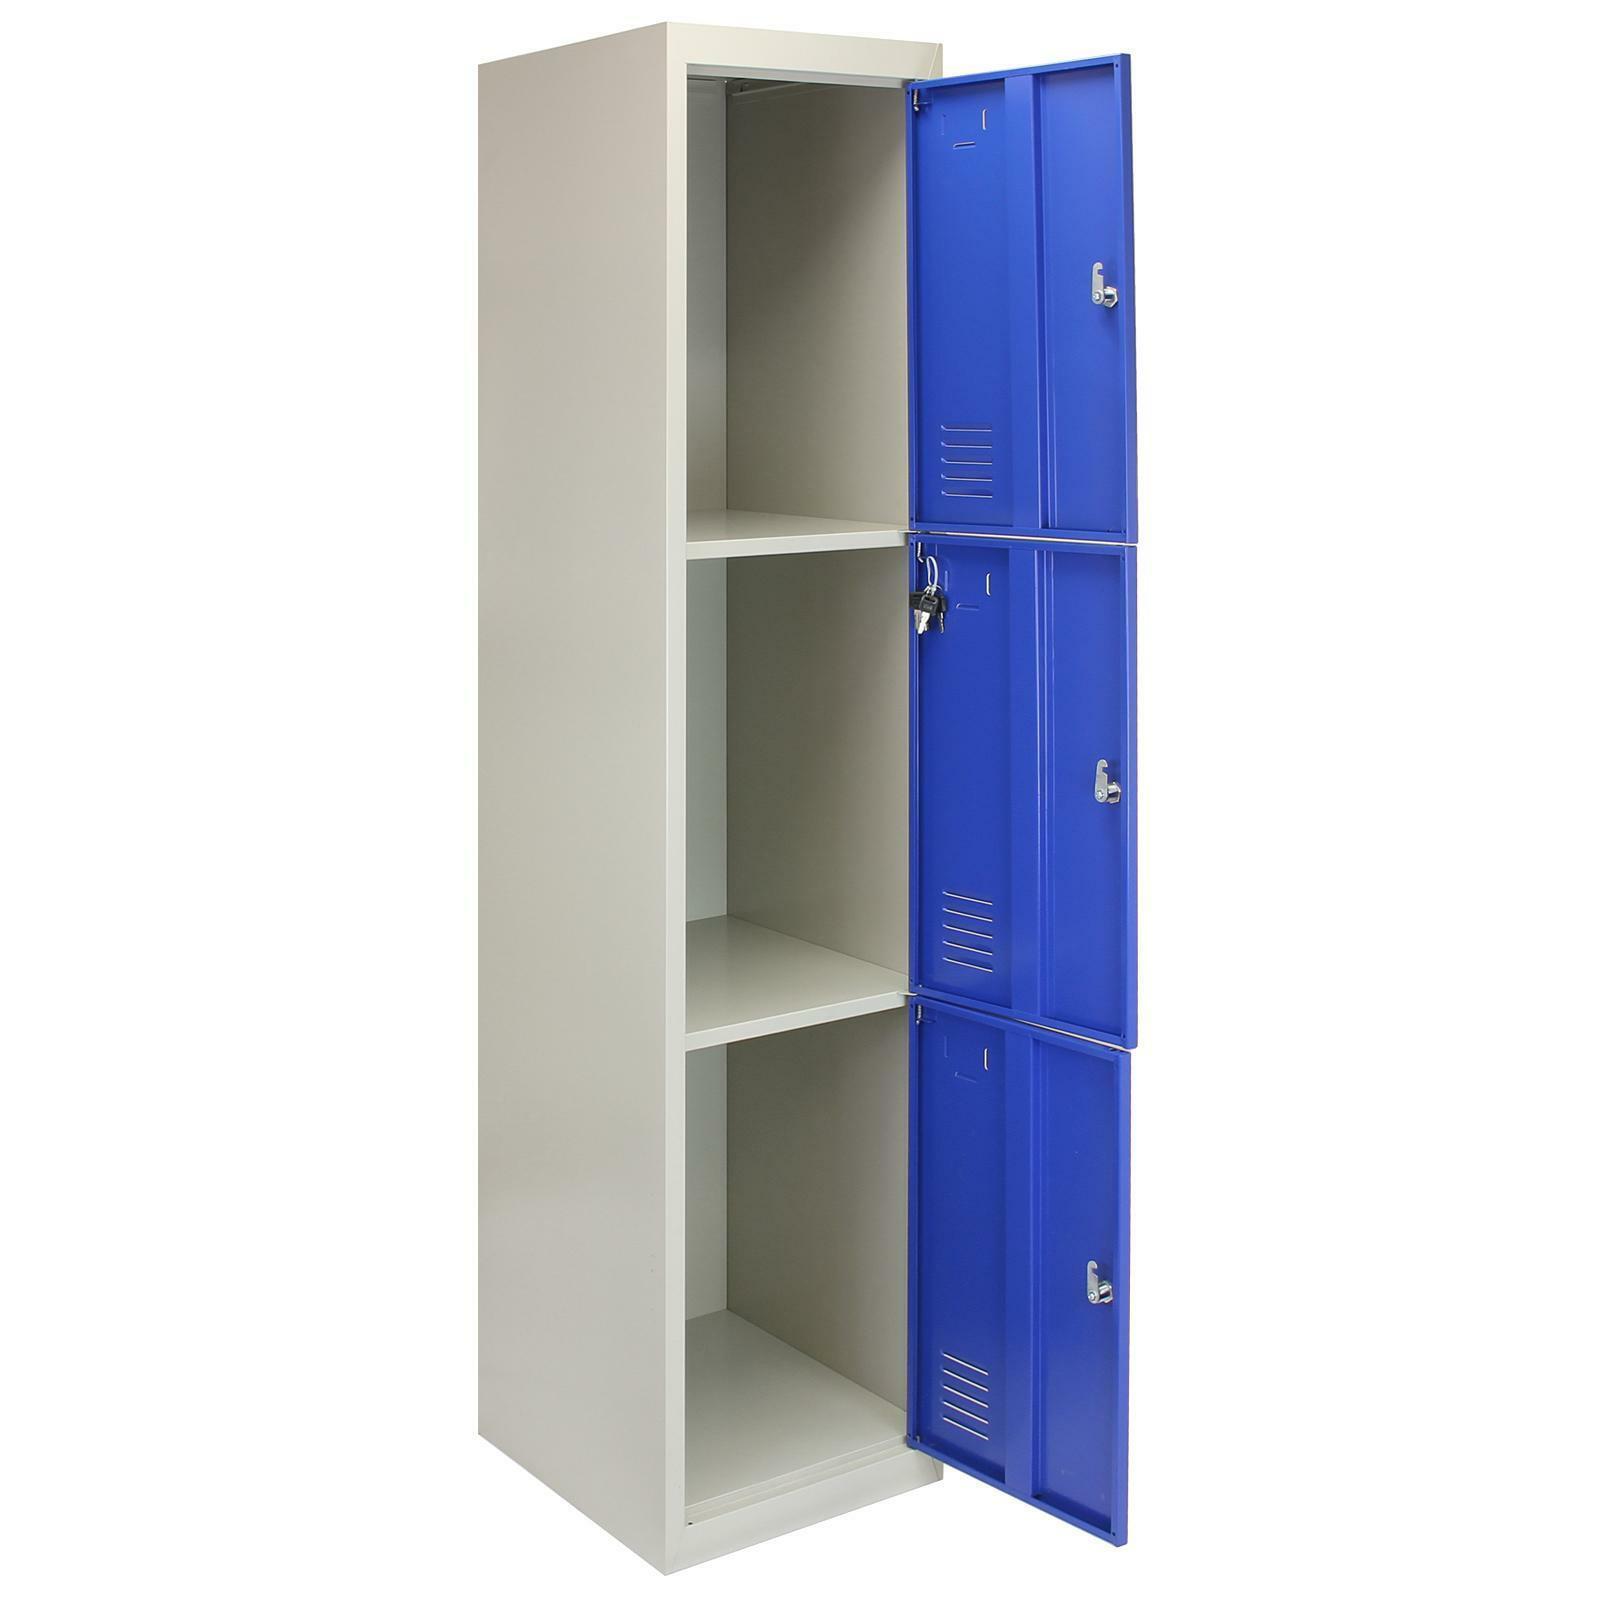 Metal Steel Staff 3 Door Lockers Locker Storage Gym Changing Room Blue 45cm